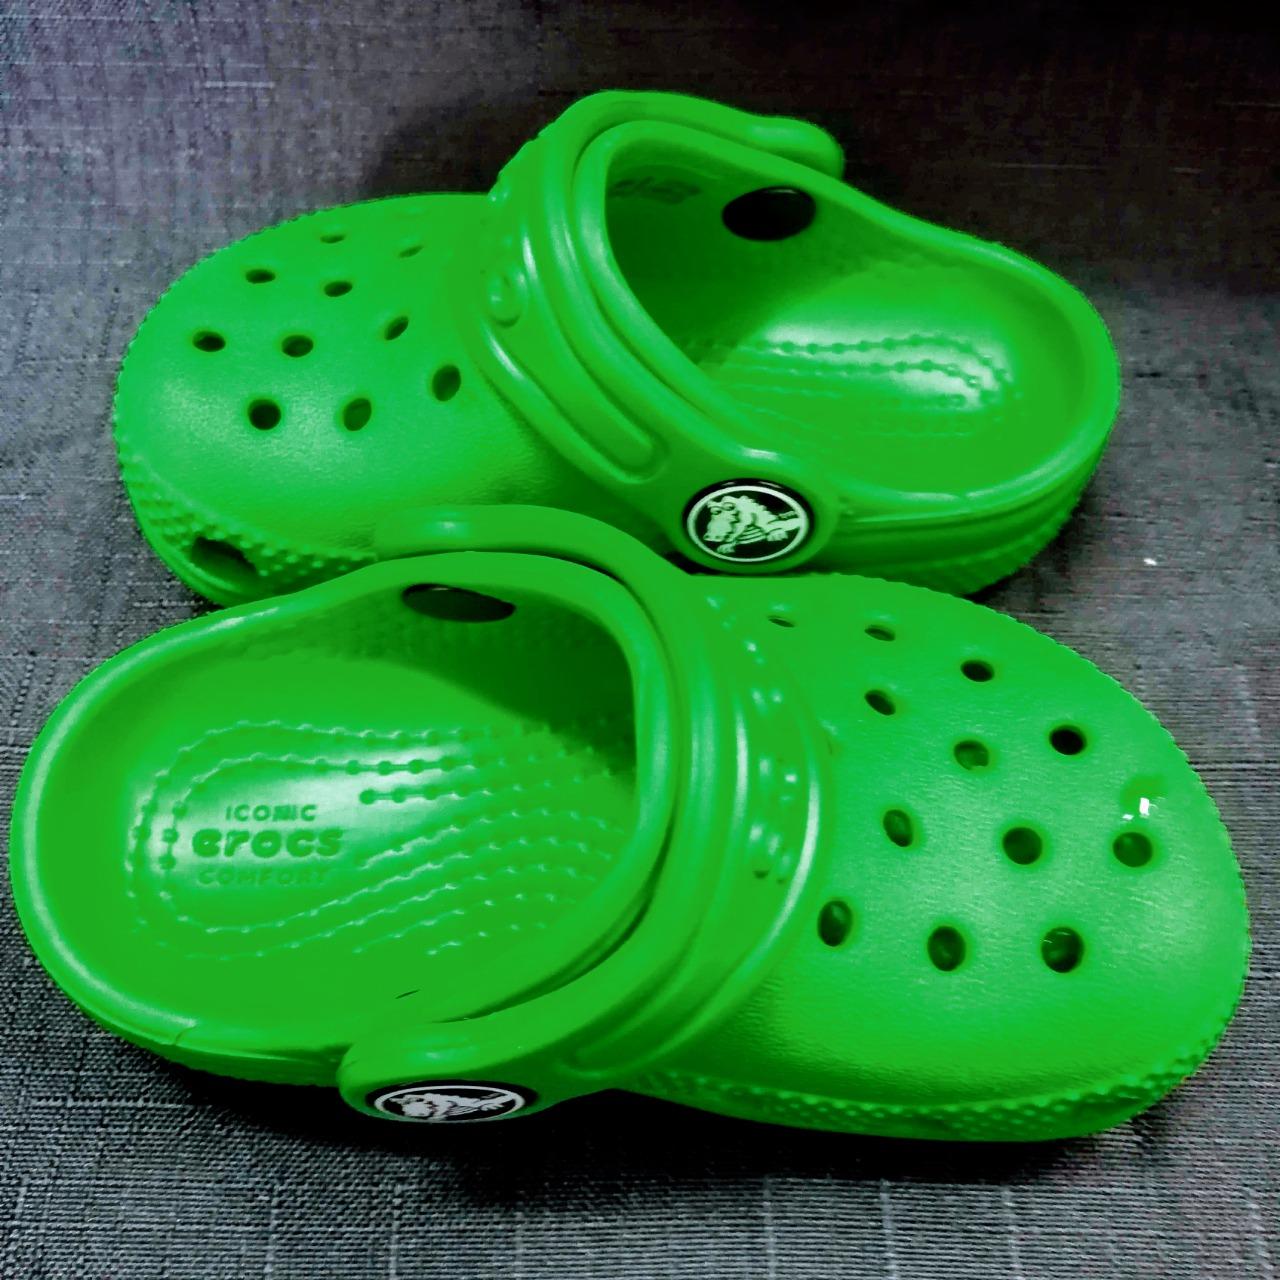 CROCS Classic Kids Clogs Green Size C 4